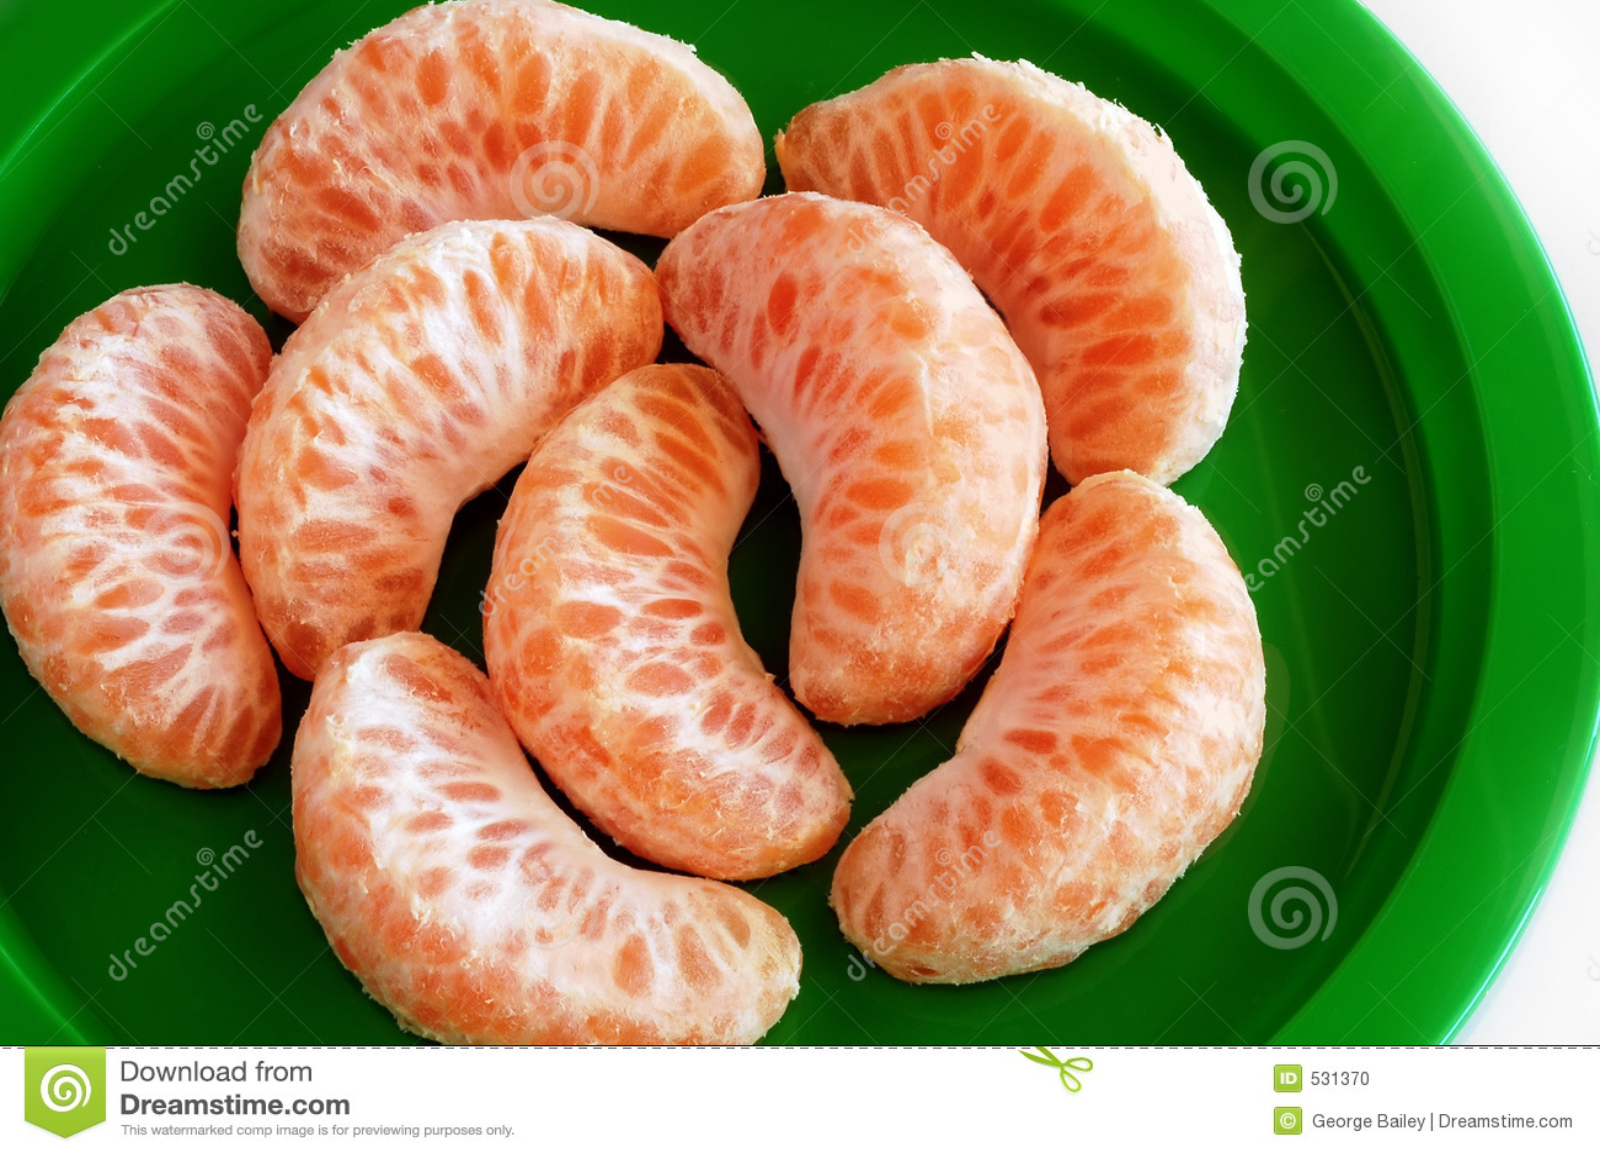 Download 橙色片式 库存照片. 图片 包括有 酸化, 佛罗里达, 橙色, 健康, 片式, 果子, 素食主义者, 维生素 - 531370